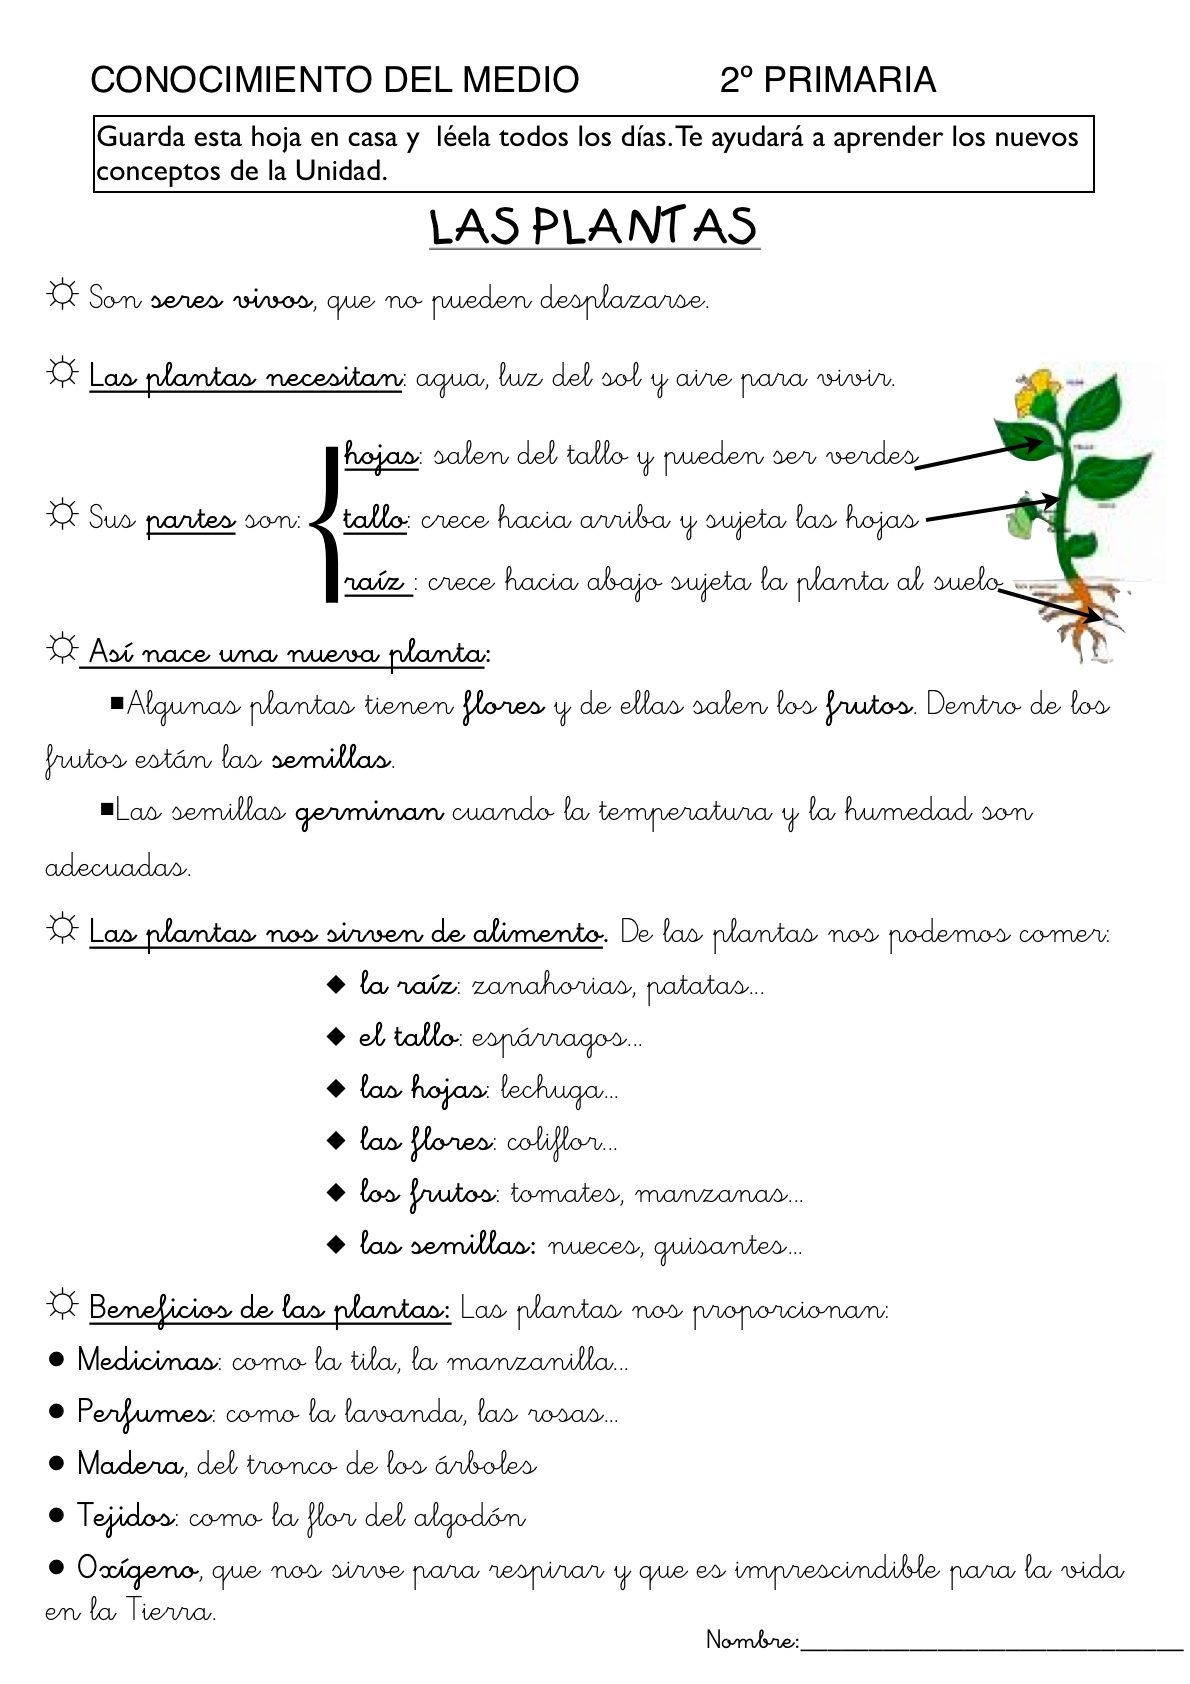 Las plantas aprendizaje pinterest las plantas - Fichas de plantas para ninos ...